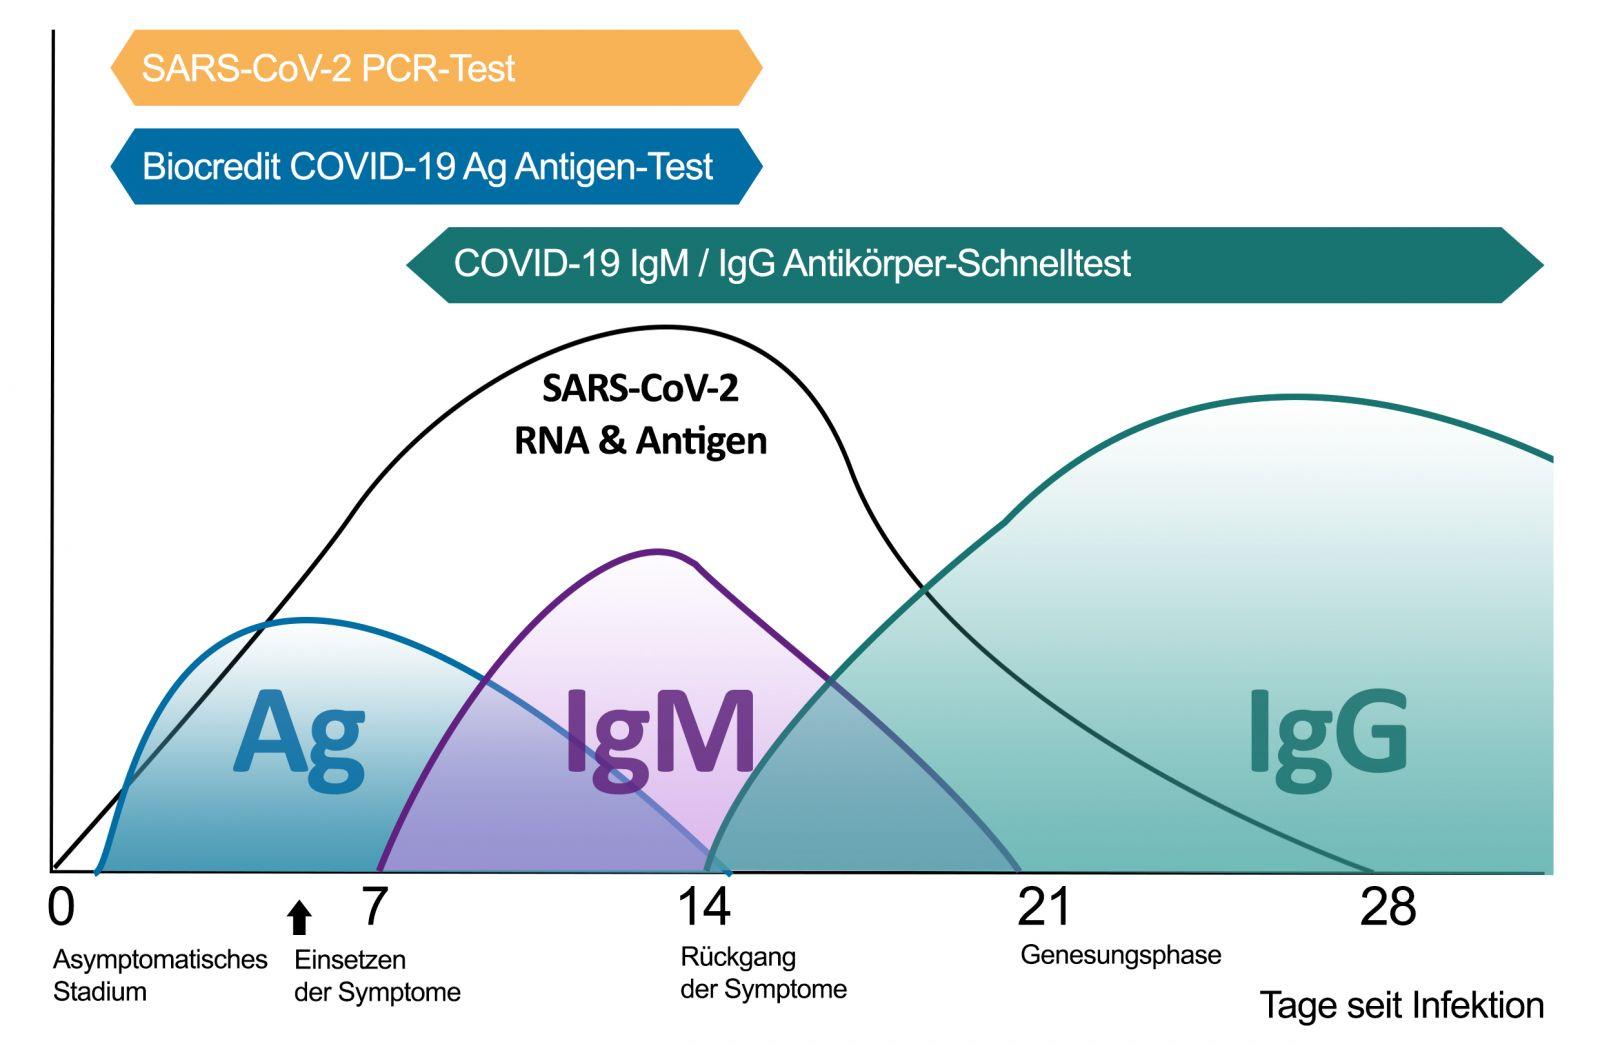 Antibody Response to COVID-19 Infection